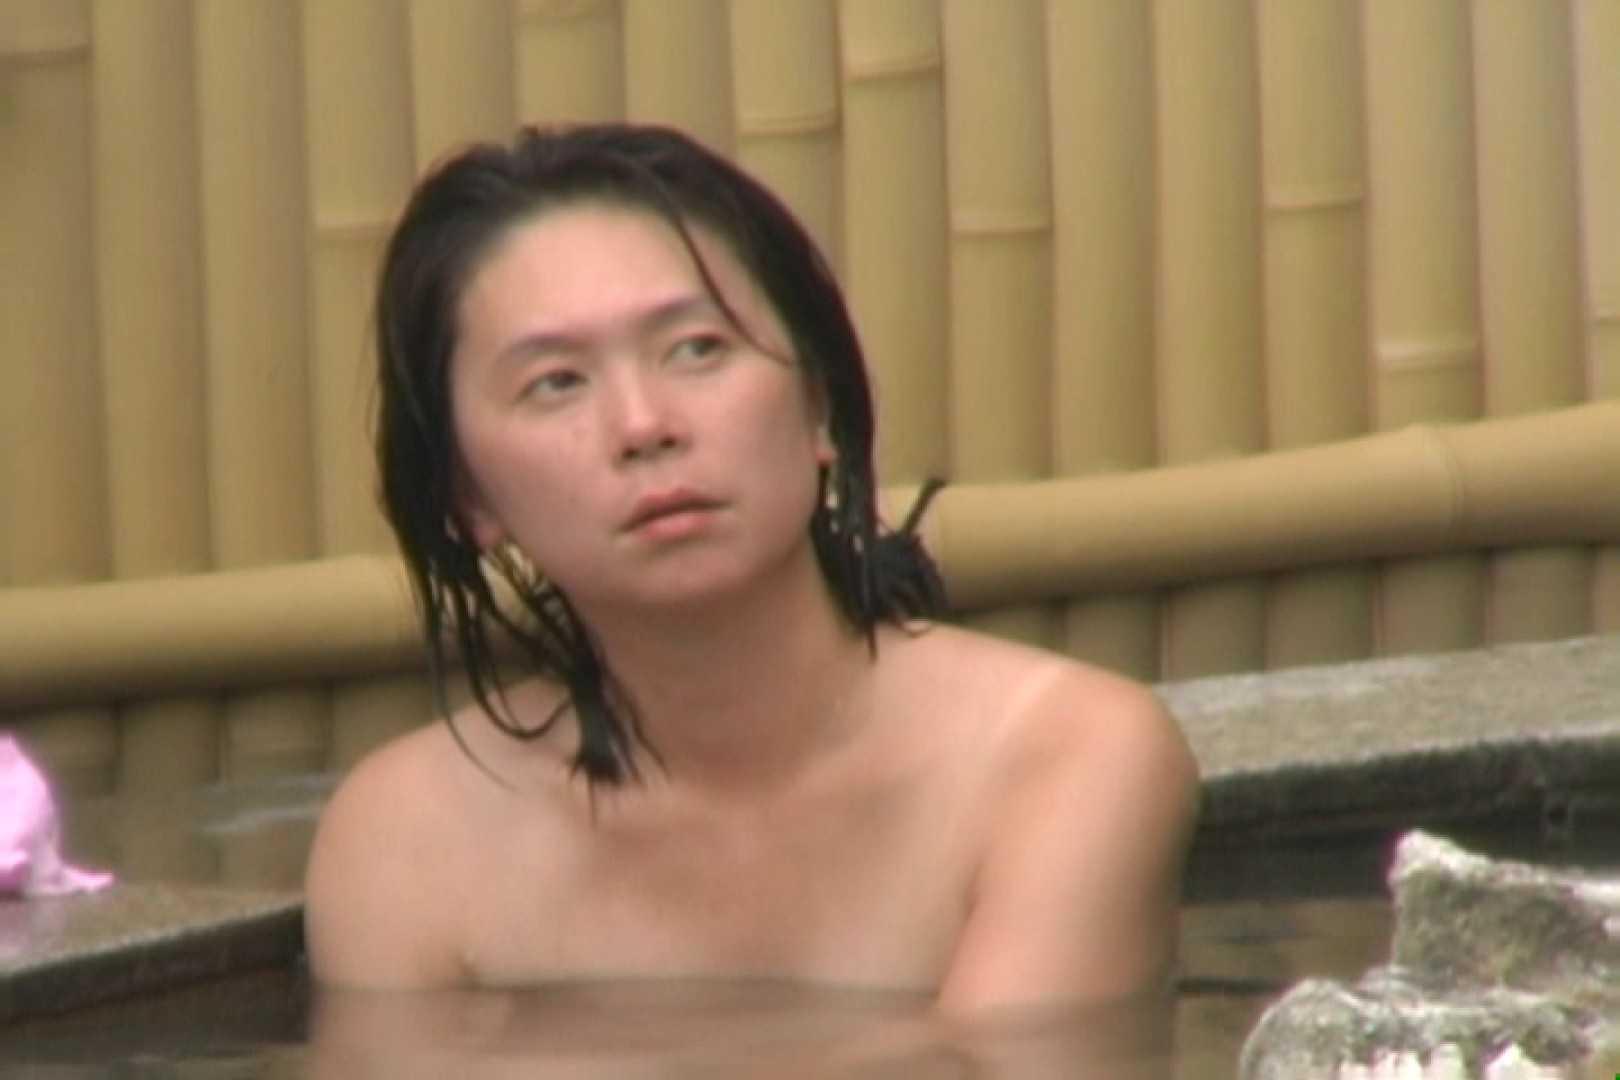 Aquaな露天風呂Vol.619 盗撮シリーズ | 露天風呂編  75PIX 53